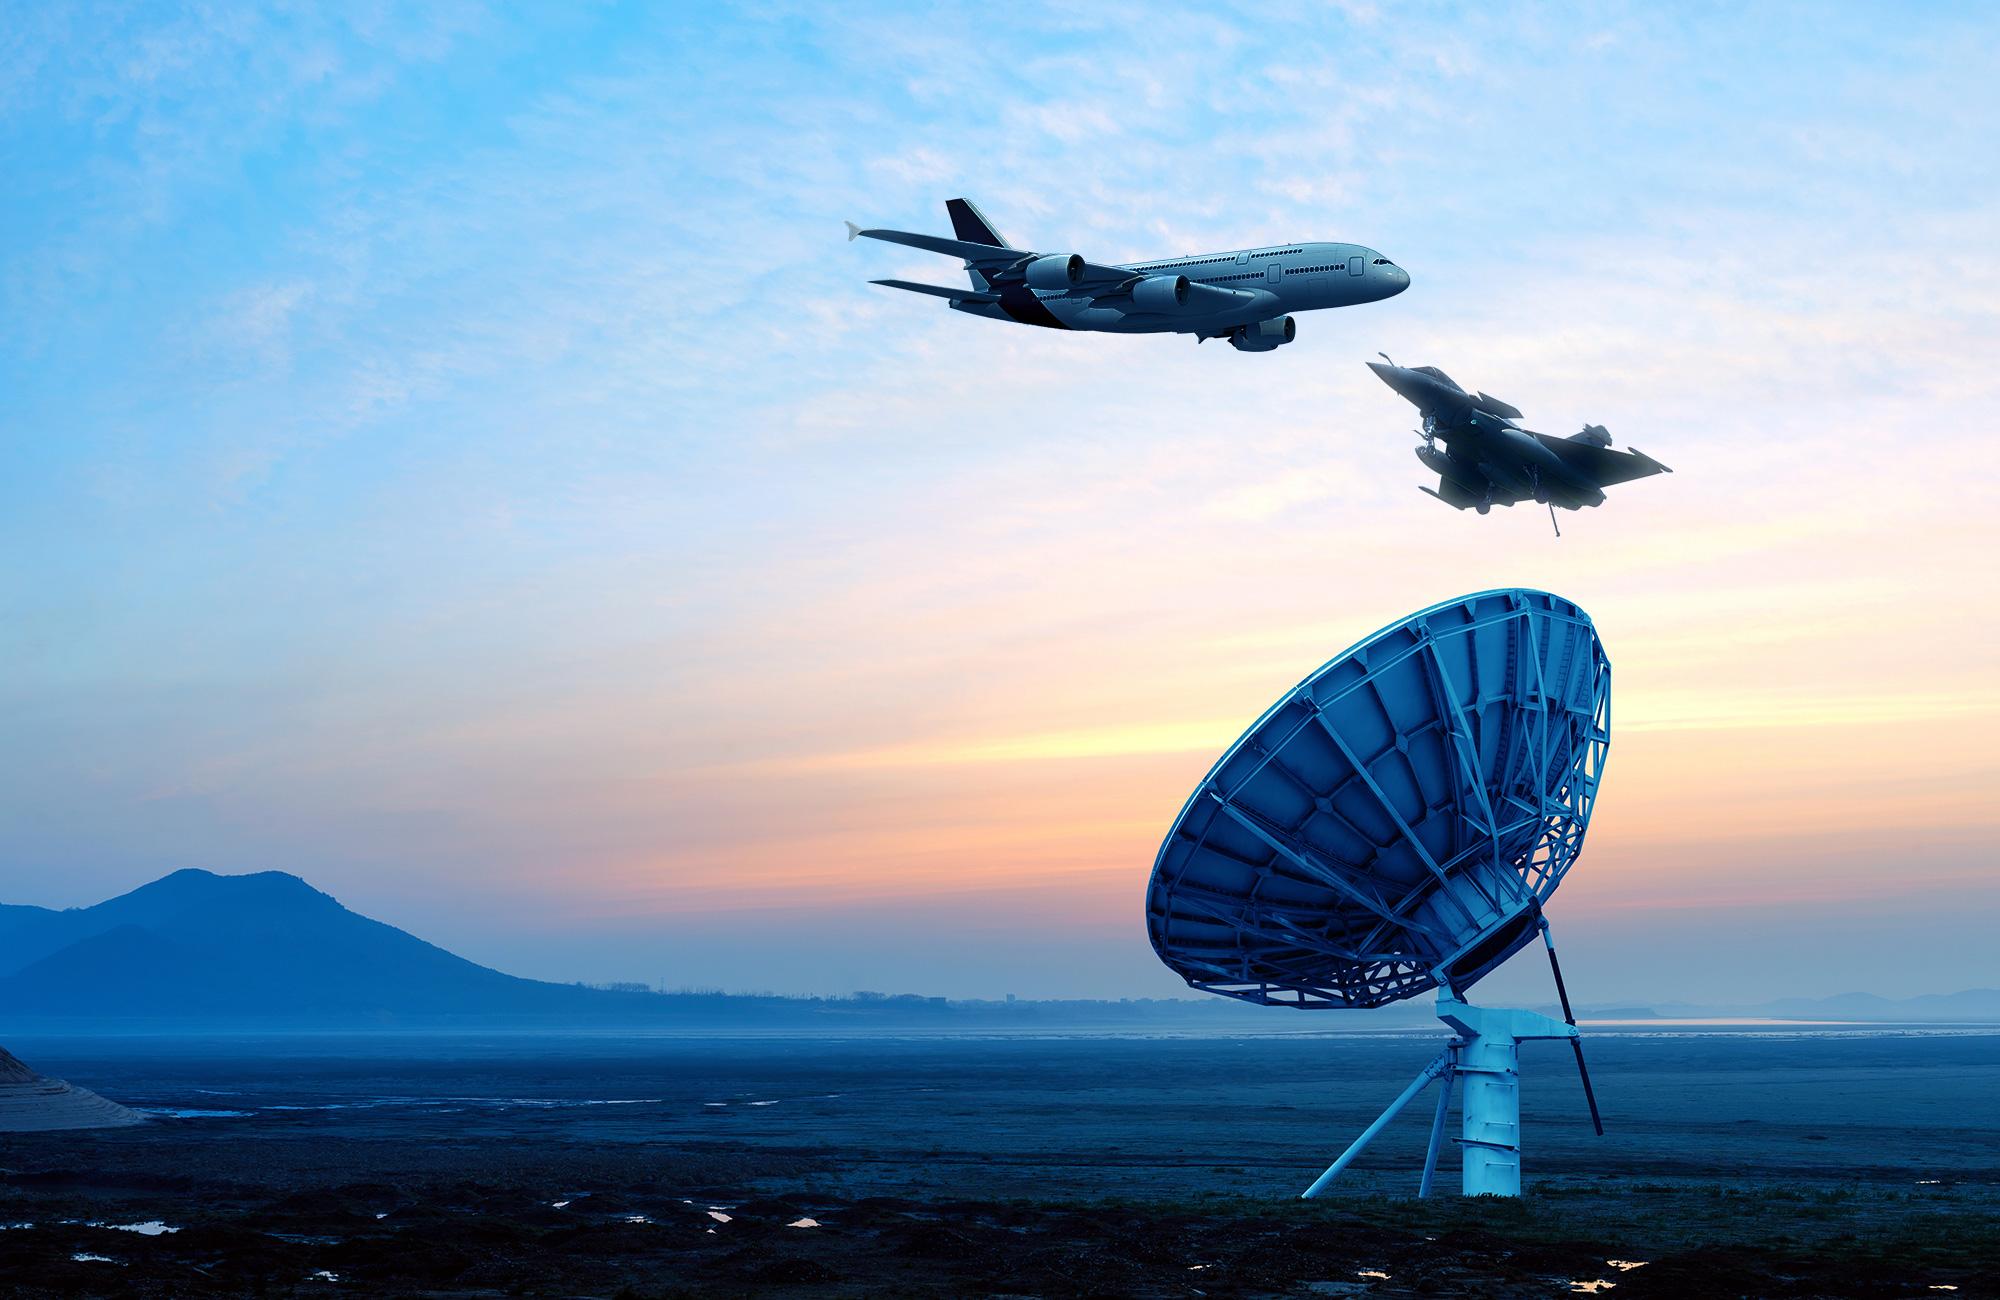 Aeronautics, aerospace and defense